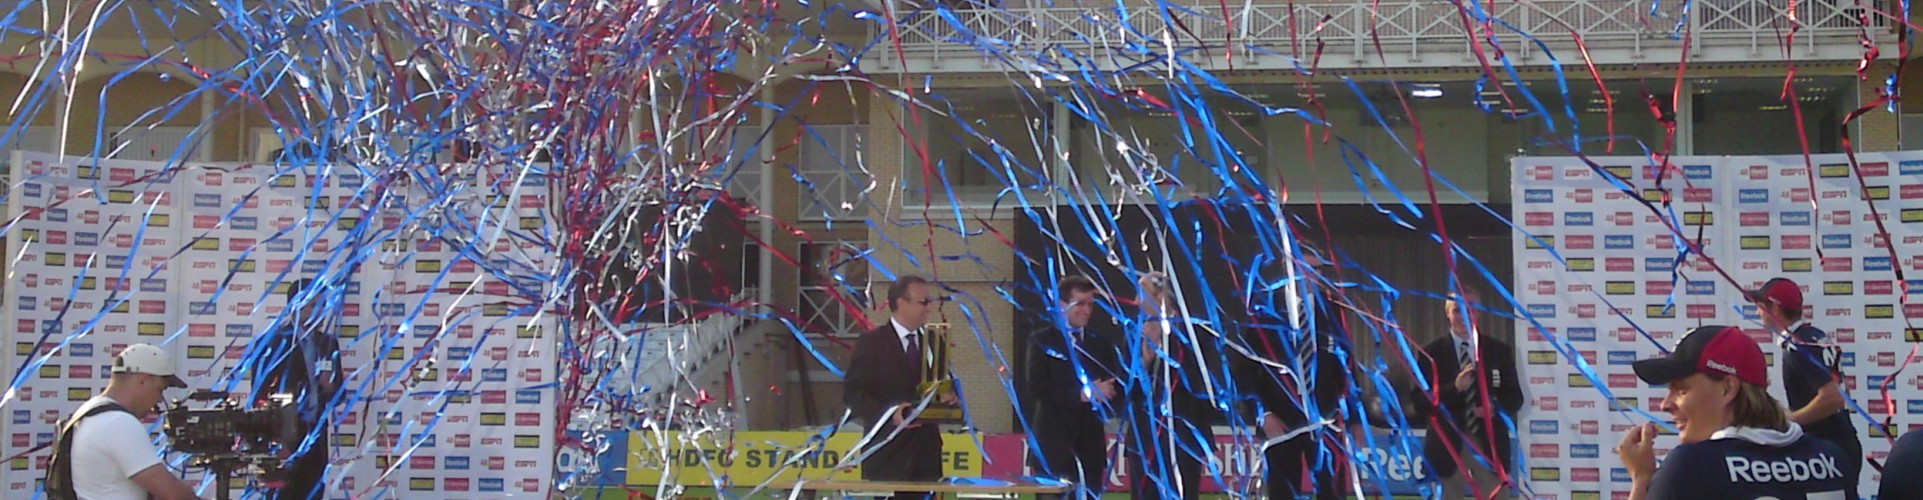 loose-confetti-banner.jpg